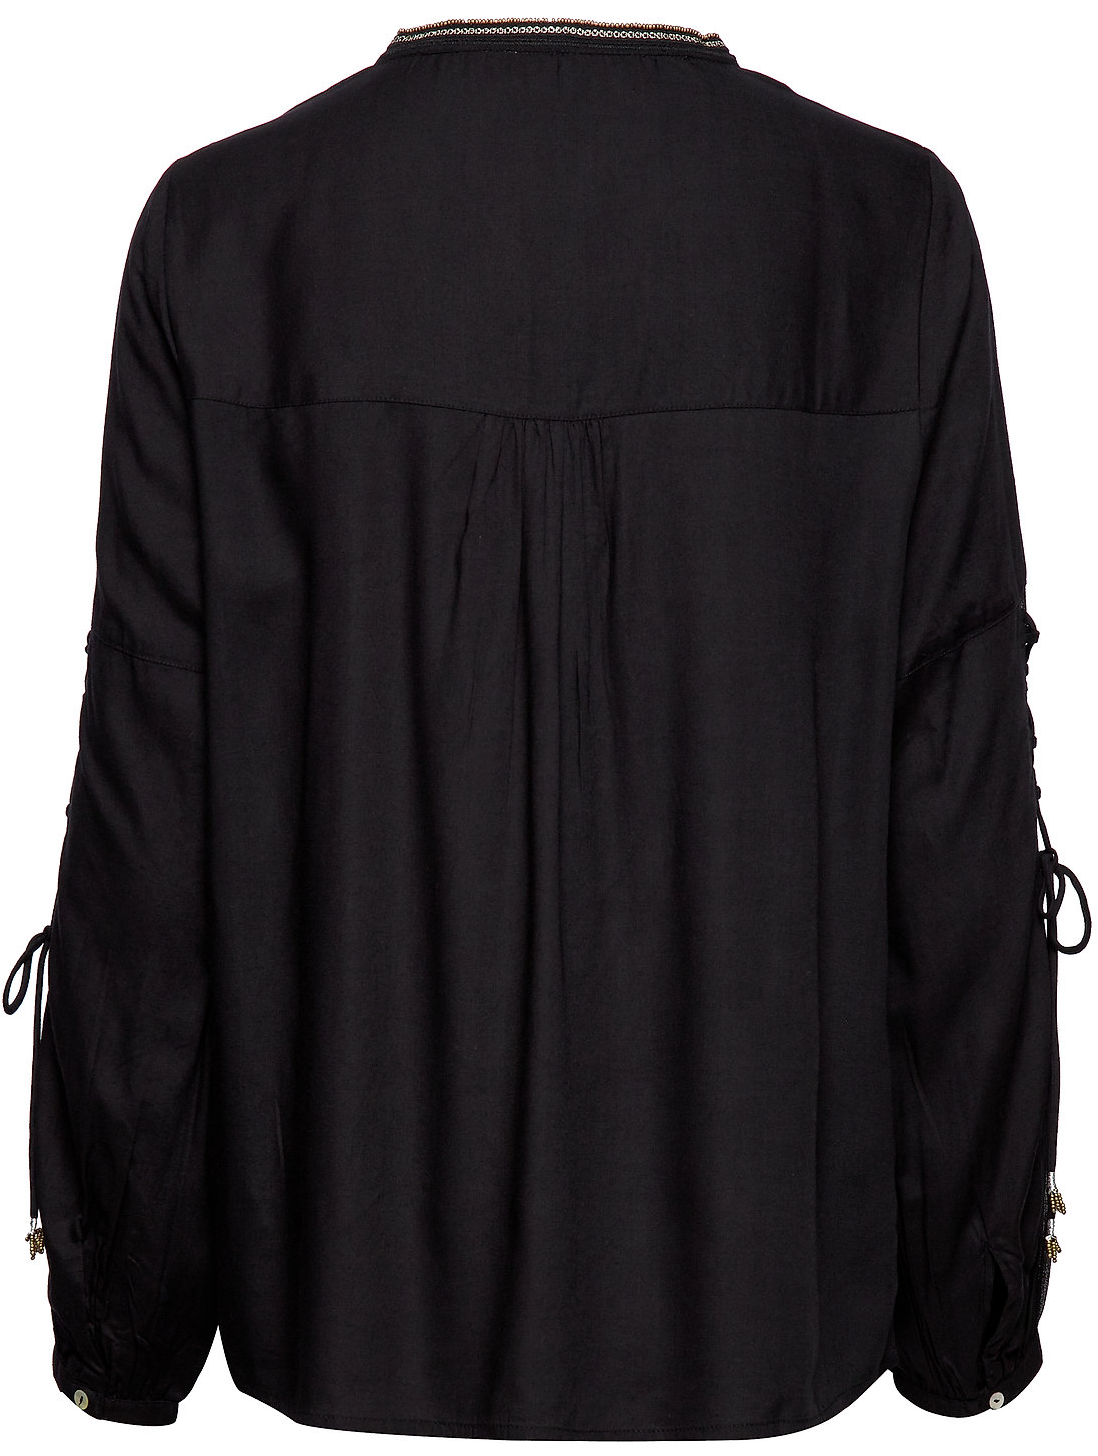 Blouse Luxa Black-2